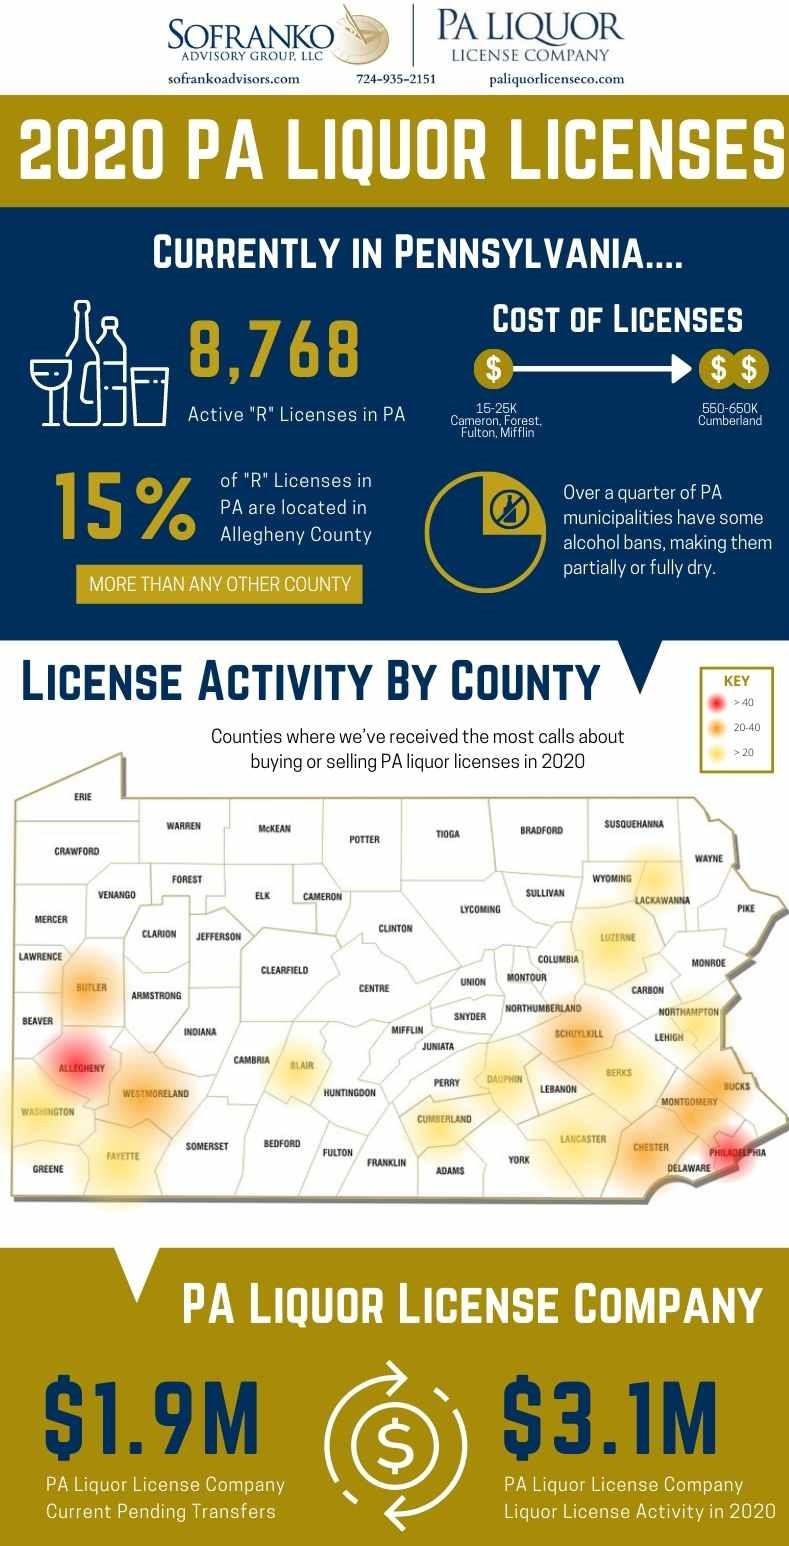 2020 PA Liquor License Information infographic